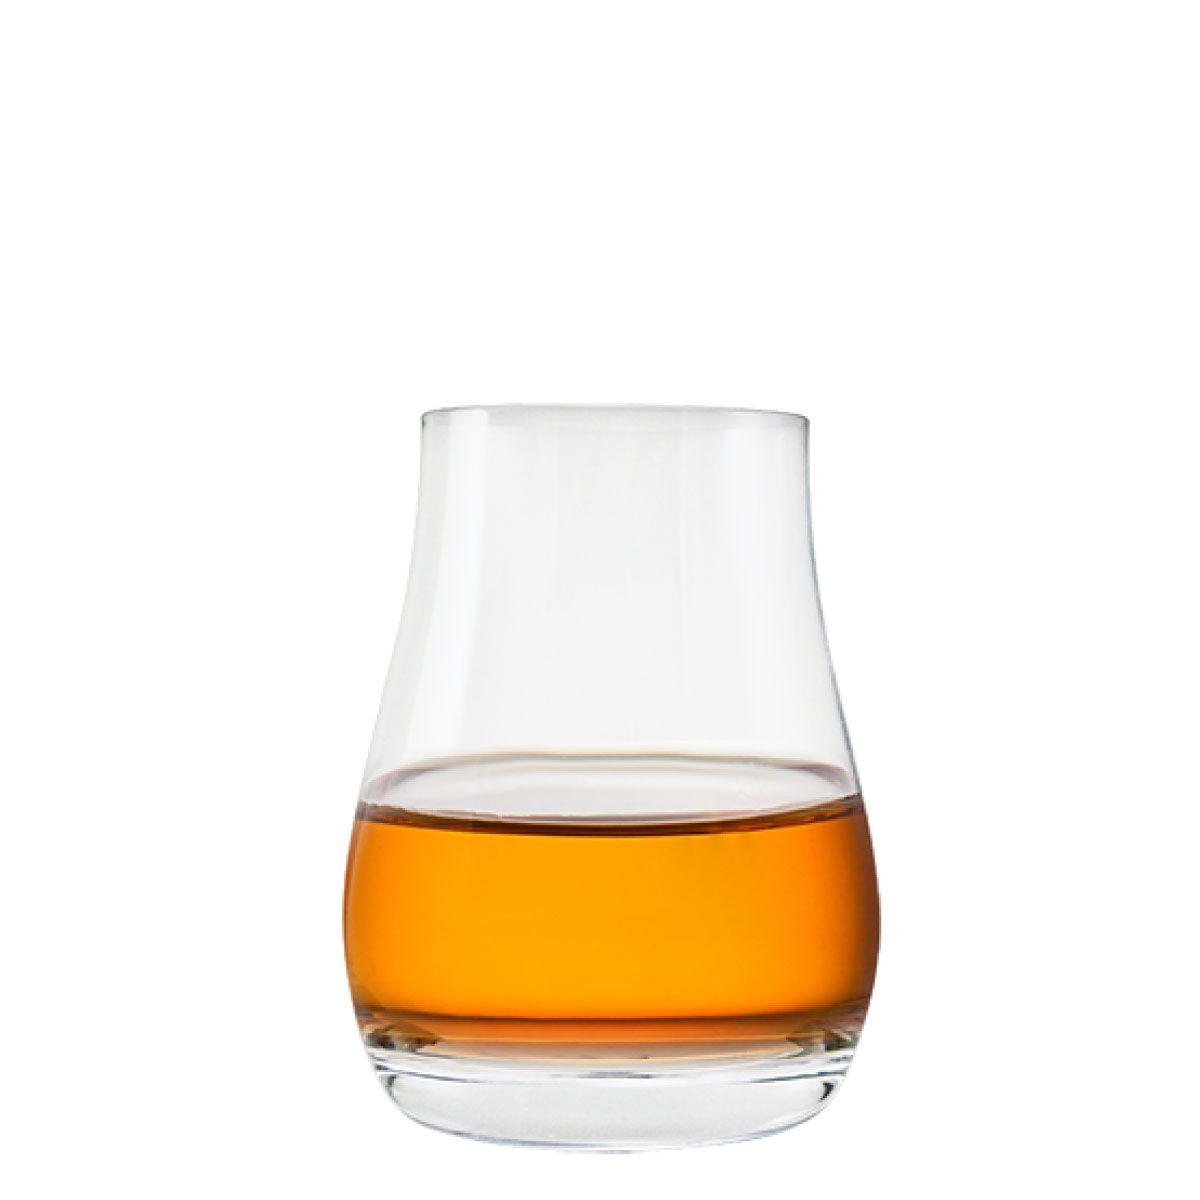 Copo Whisky Degustação 100ml 6 pcs